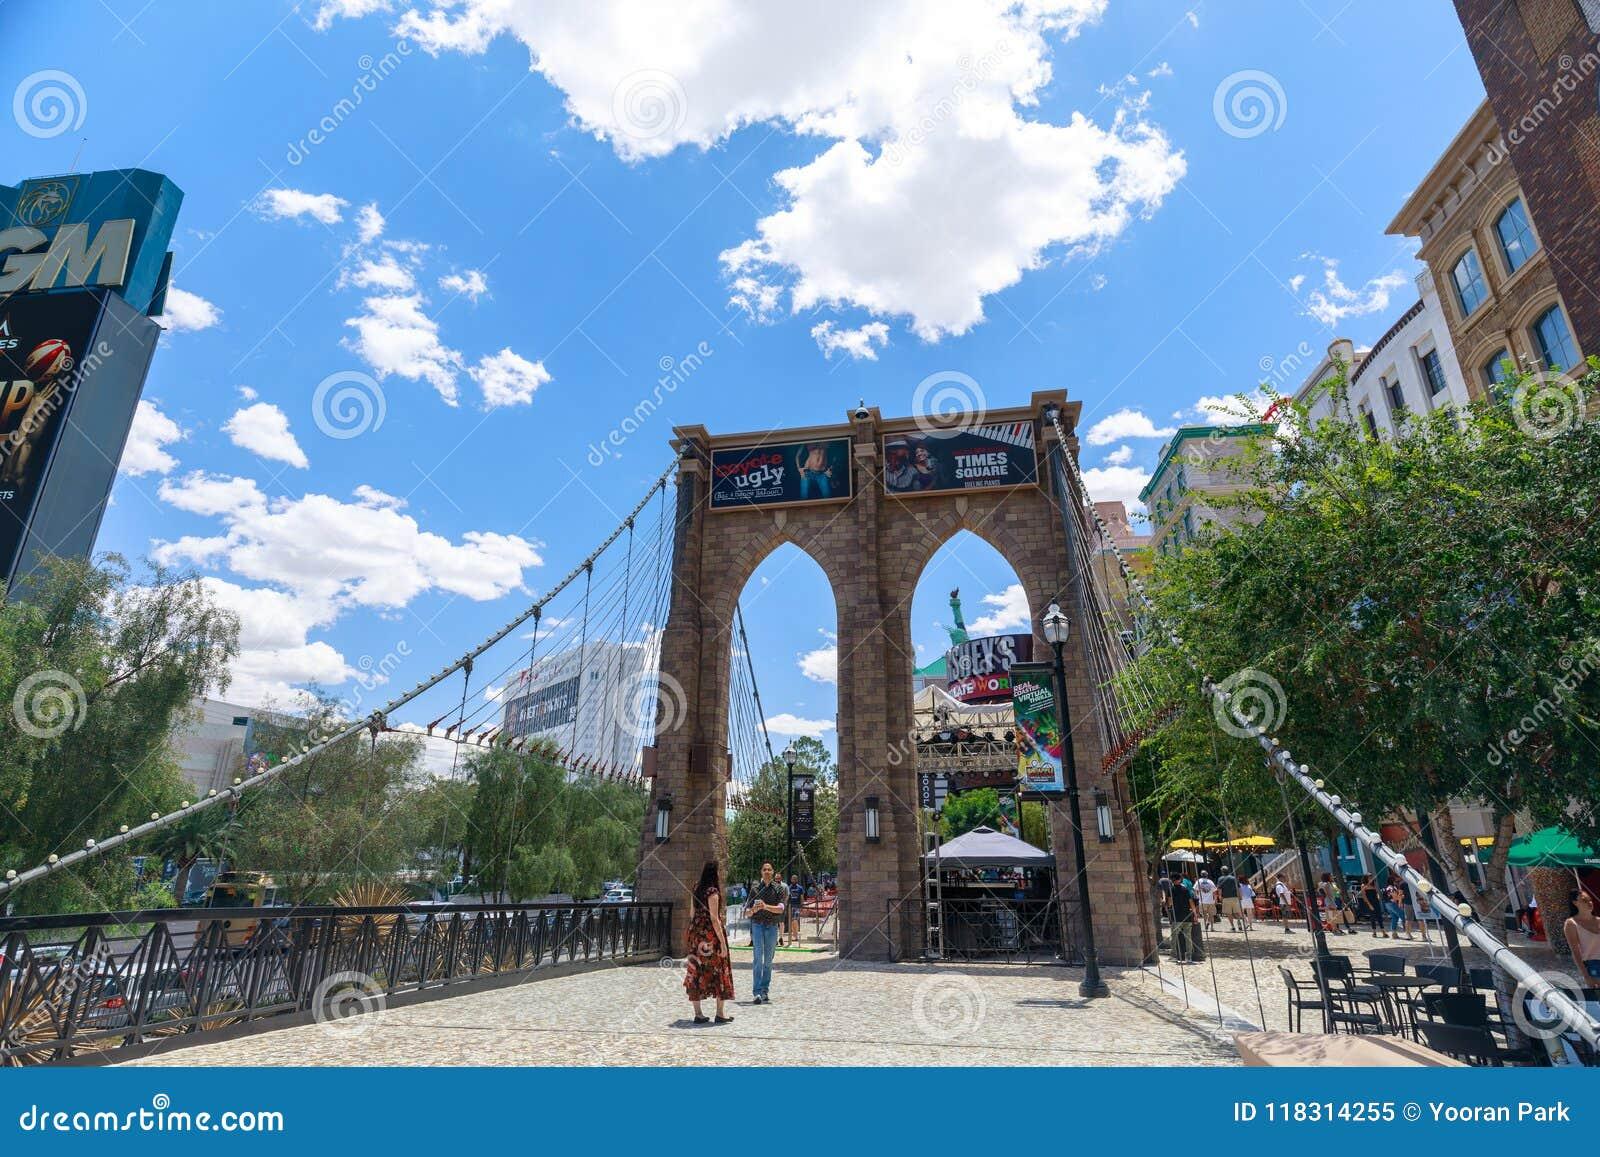 Brooklyn Bridge New York New York Hotel And Casino Las Vegas Strip